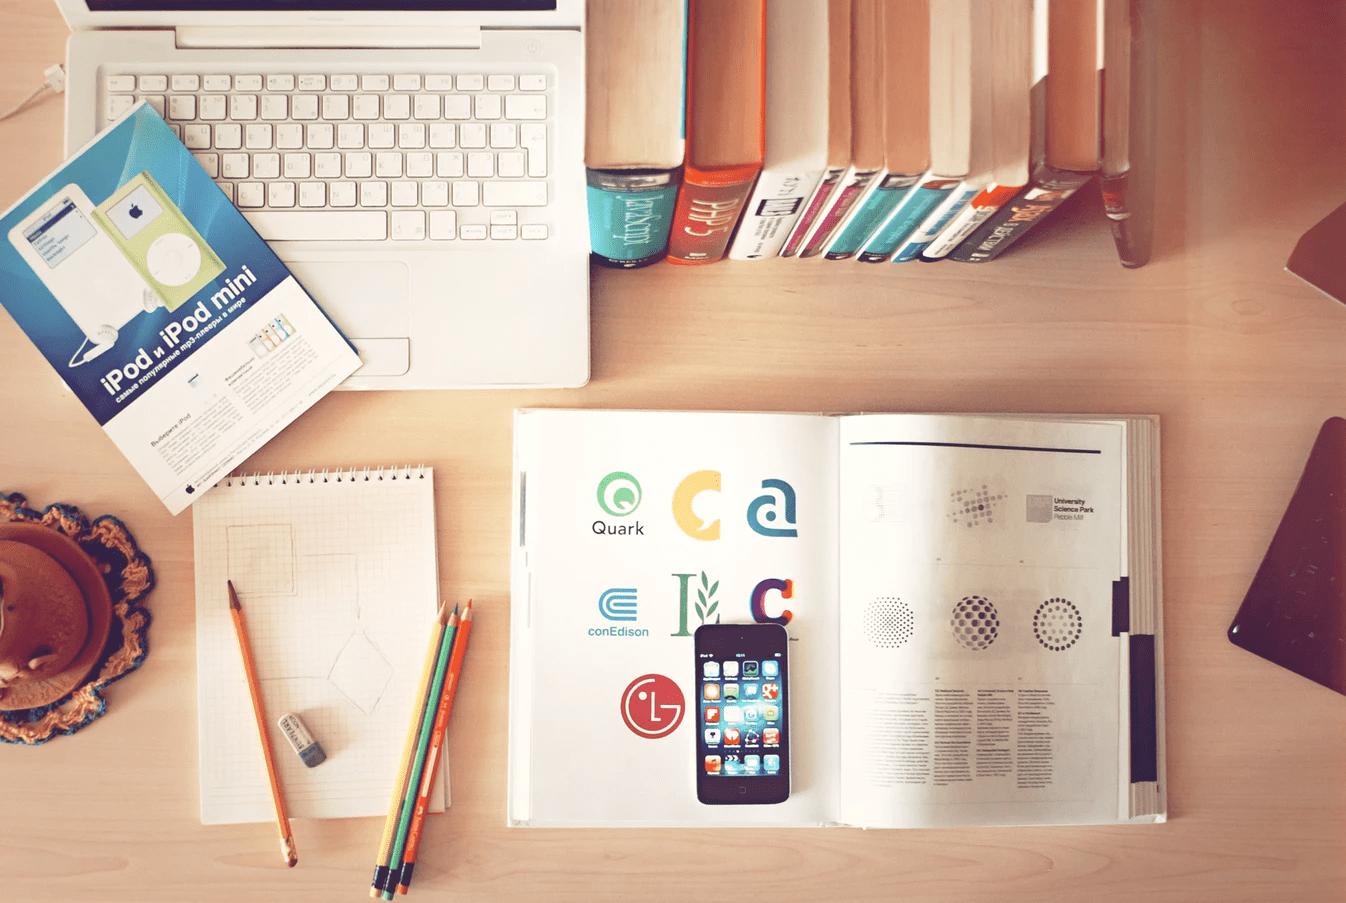 office desk showing logos